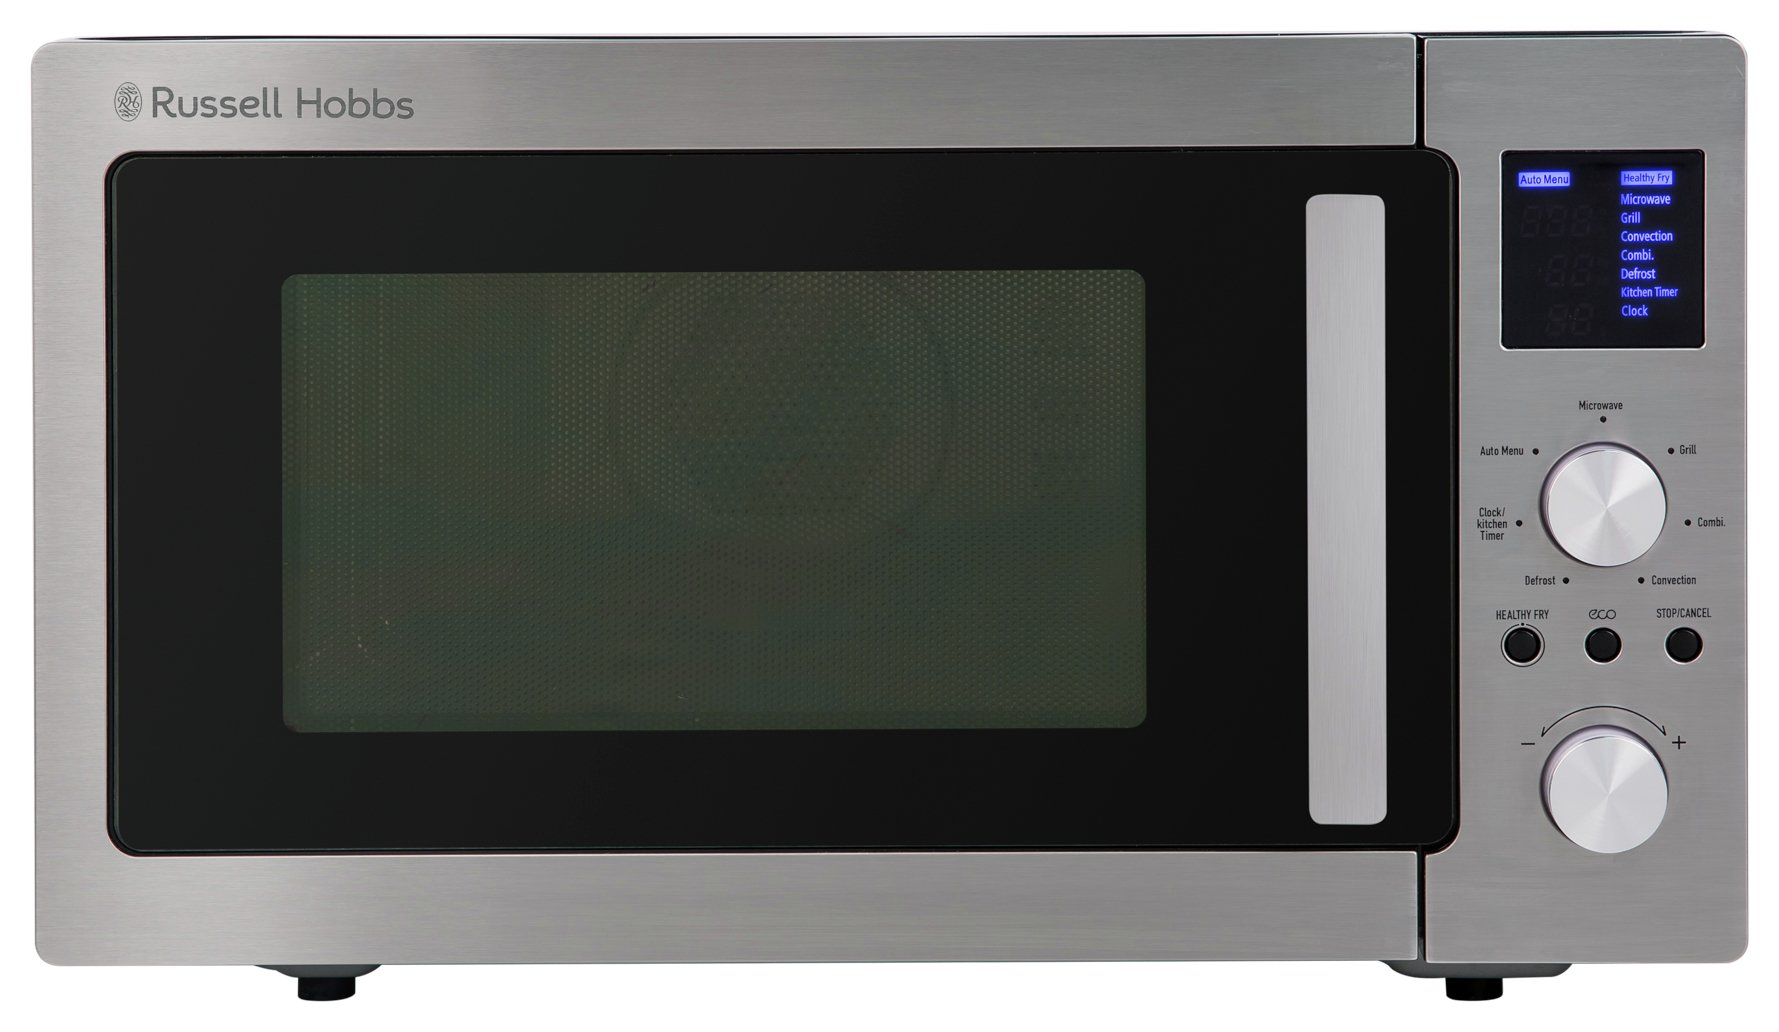 sharp r861. russell hobbs combination 900w microwave rhm2573 \u2013 s.steel sharp r861 b